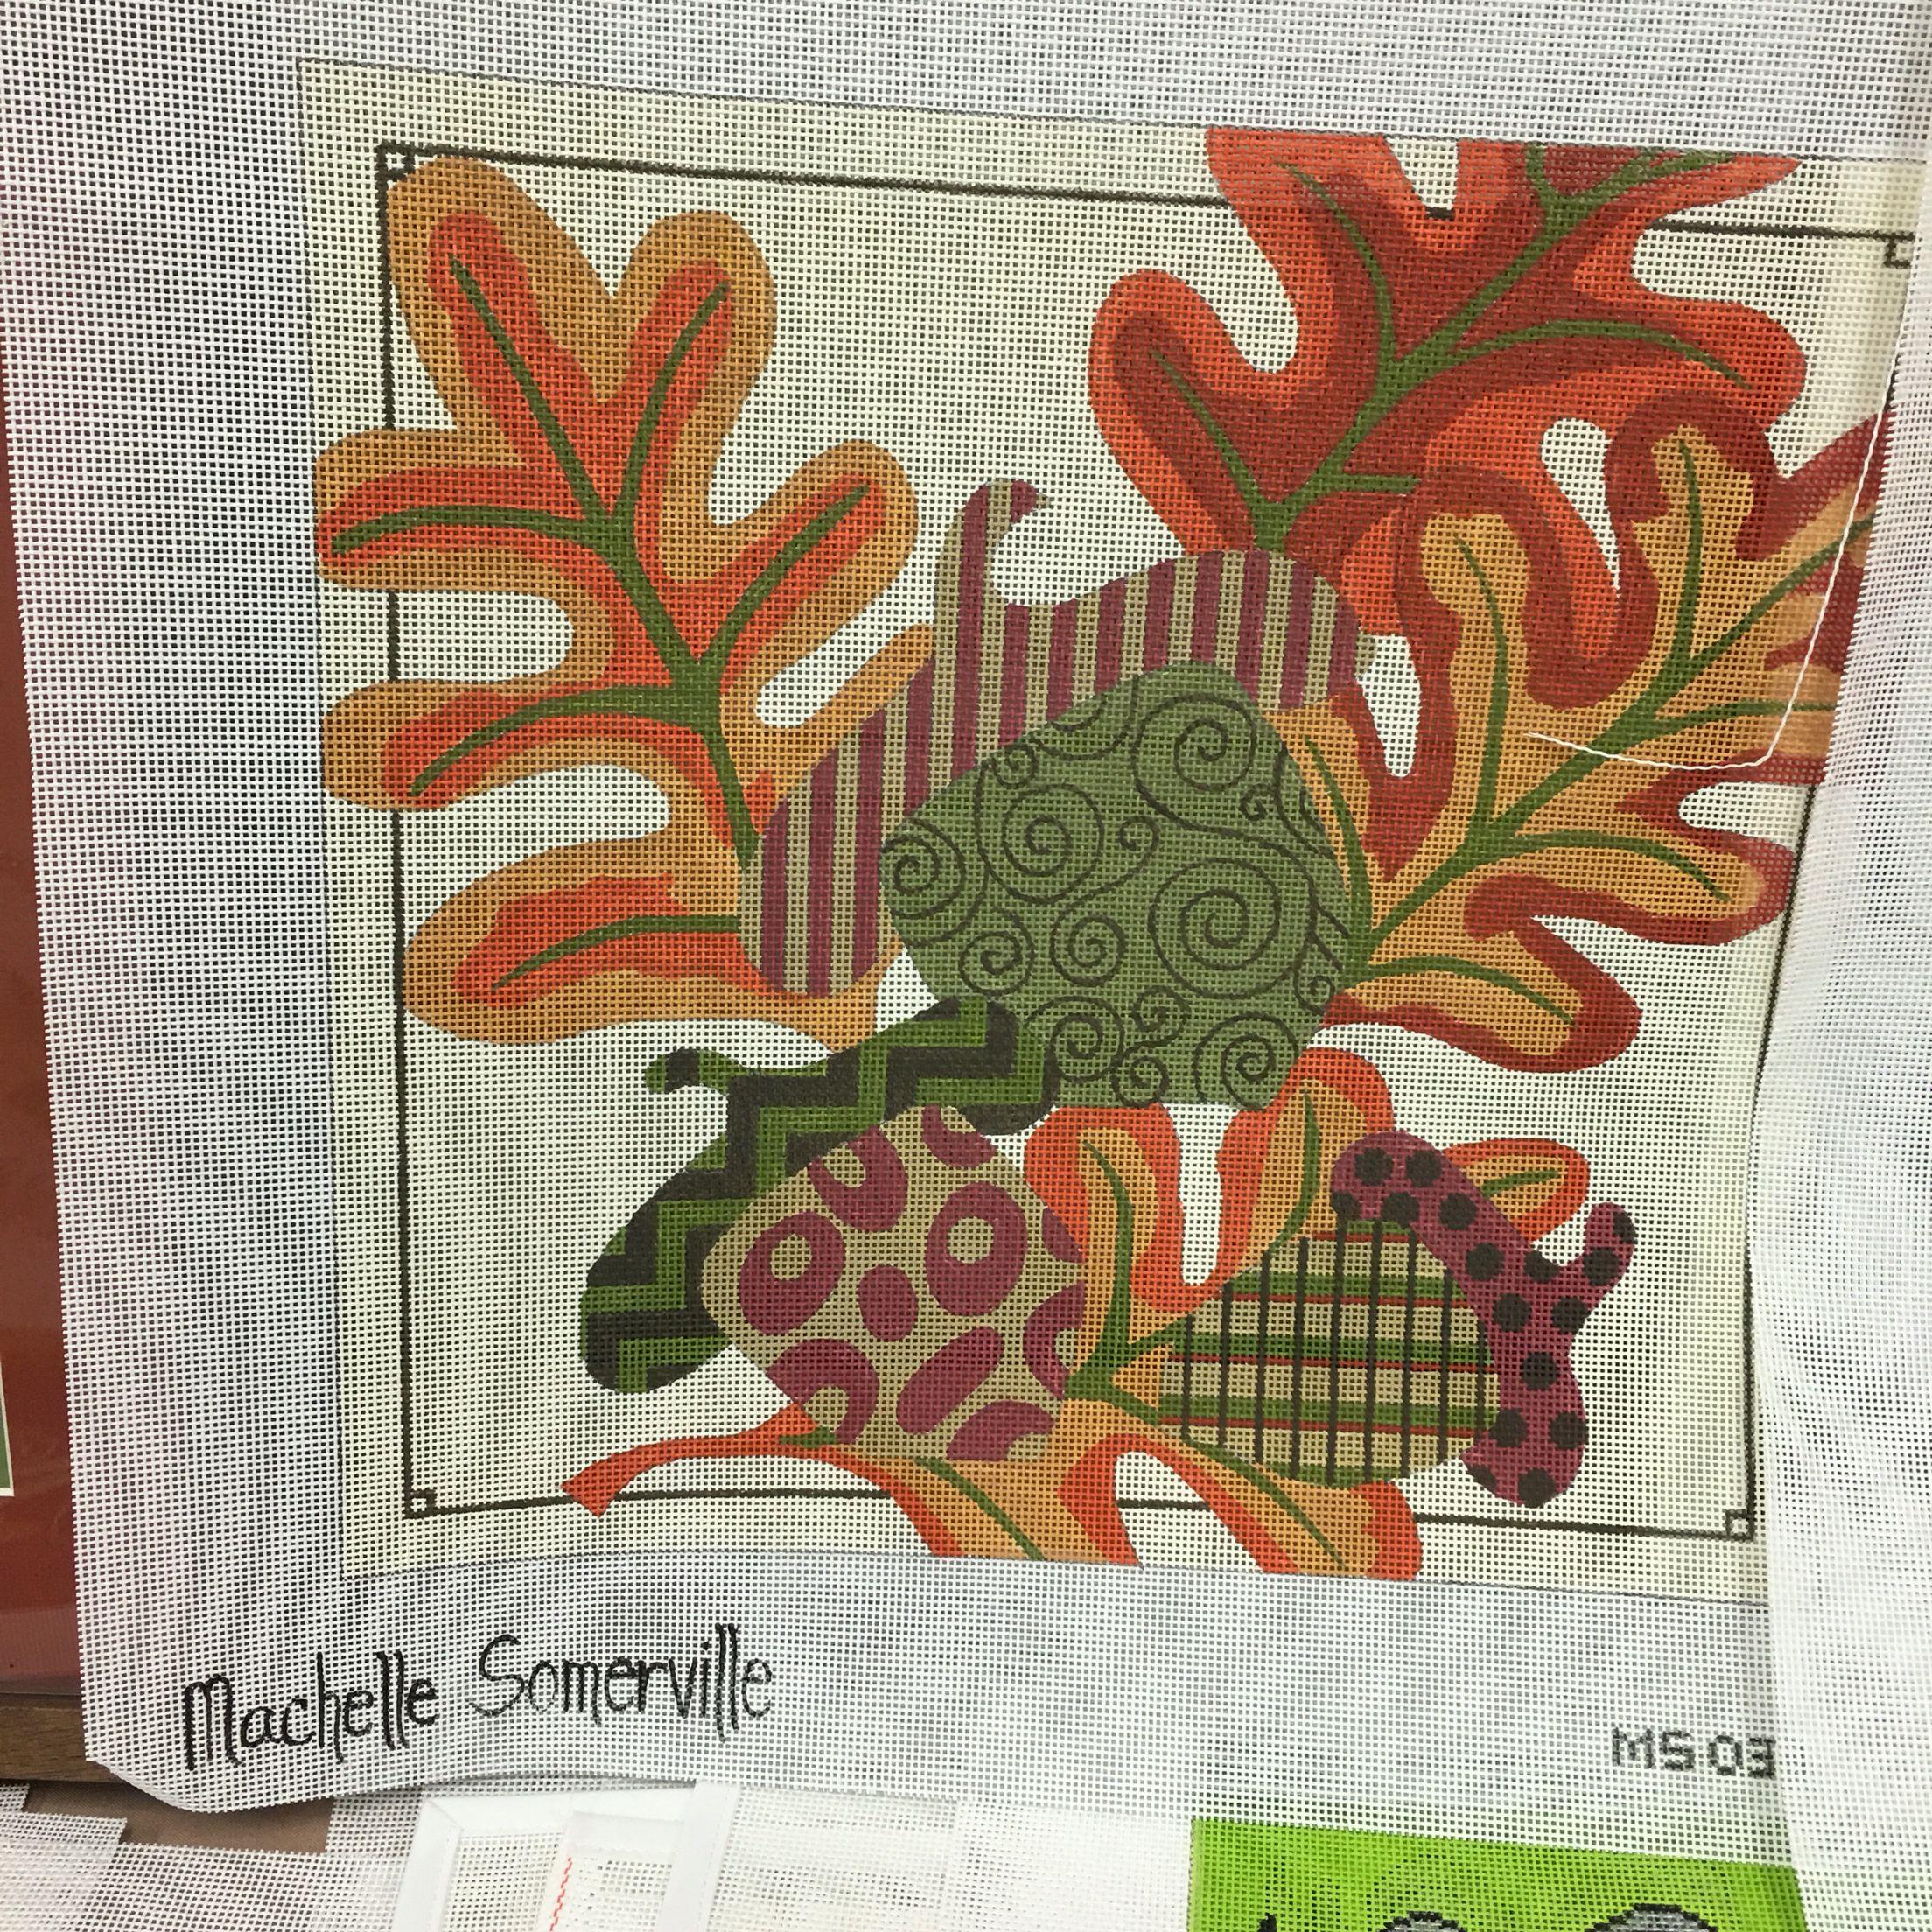 Machele Somerville Sept 2016 Destination Dallas Show